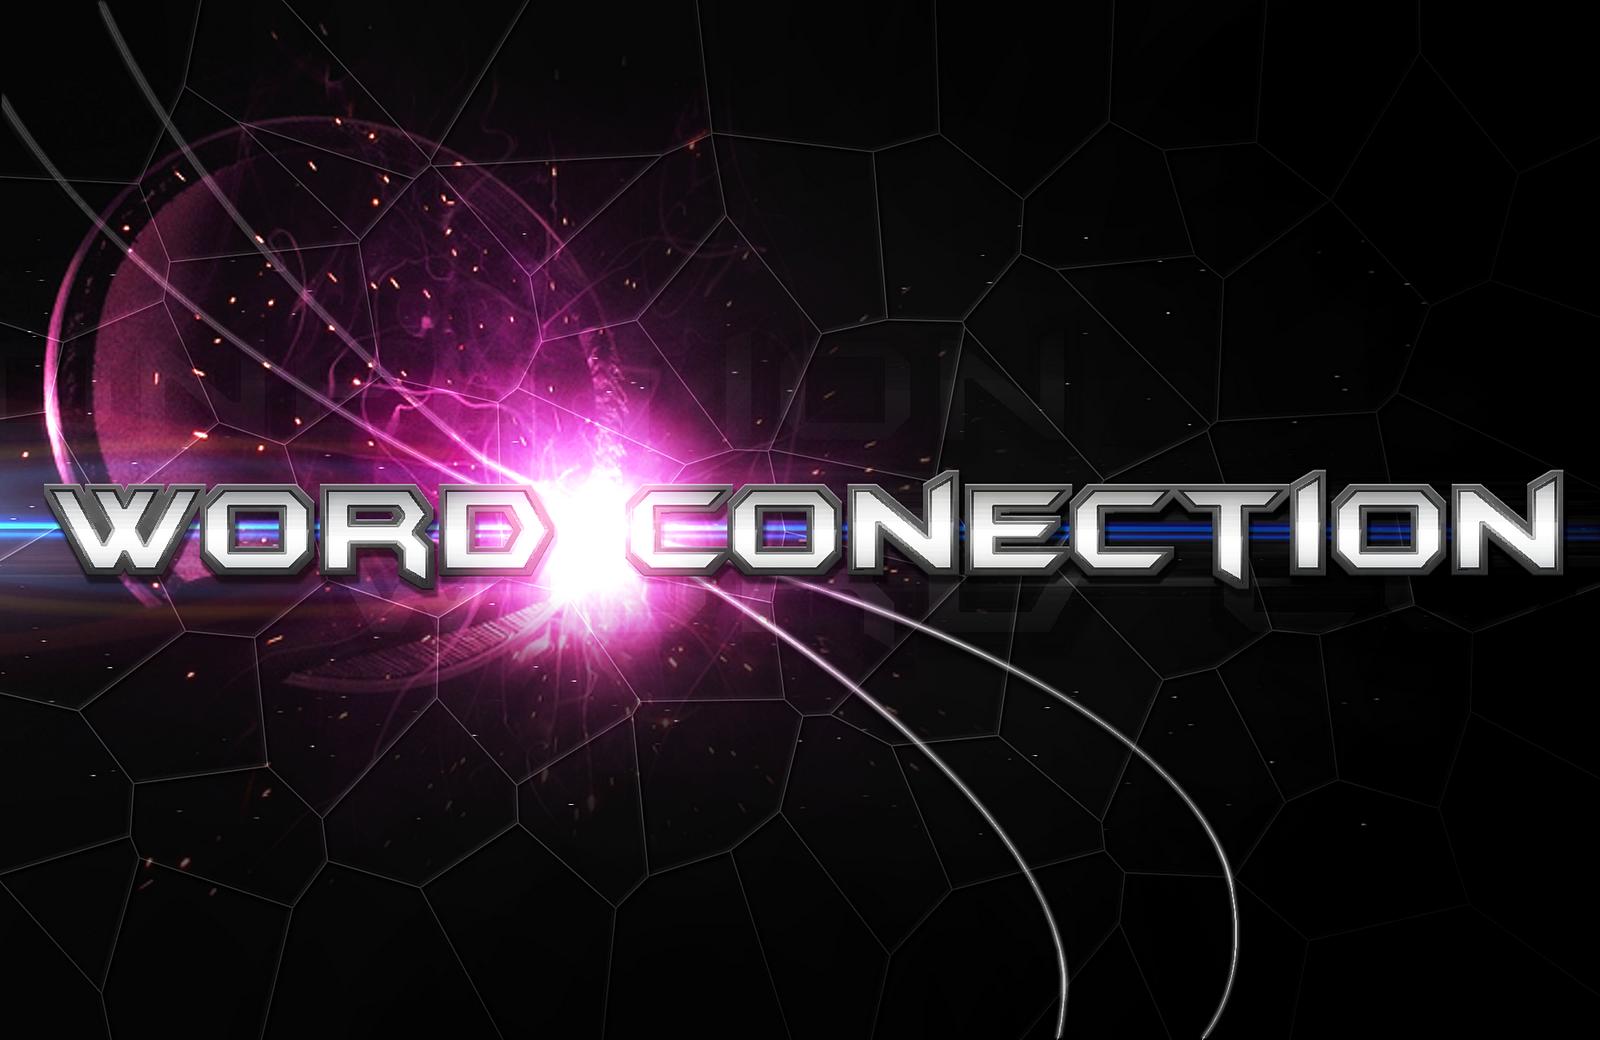 http://1.bp.blogspot.com/-mh7CerPWg48/Tc_rcHO6NbI/AAAAAAAACRc/9t6vqQBf3R4/s1600/Wallpaper+Word+conection.png